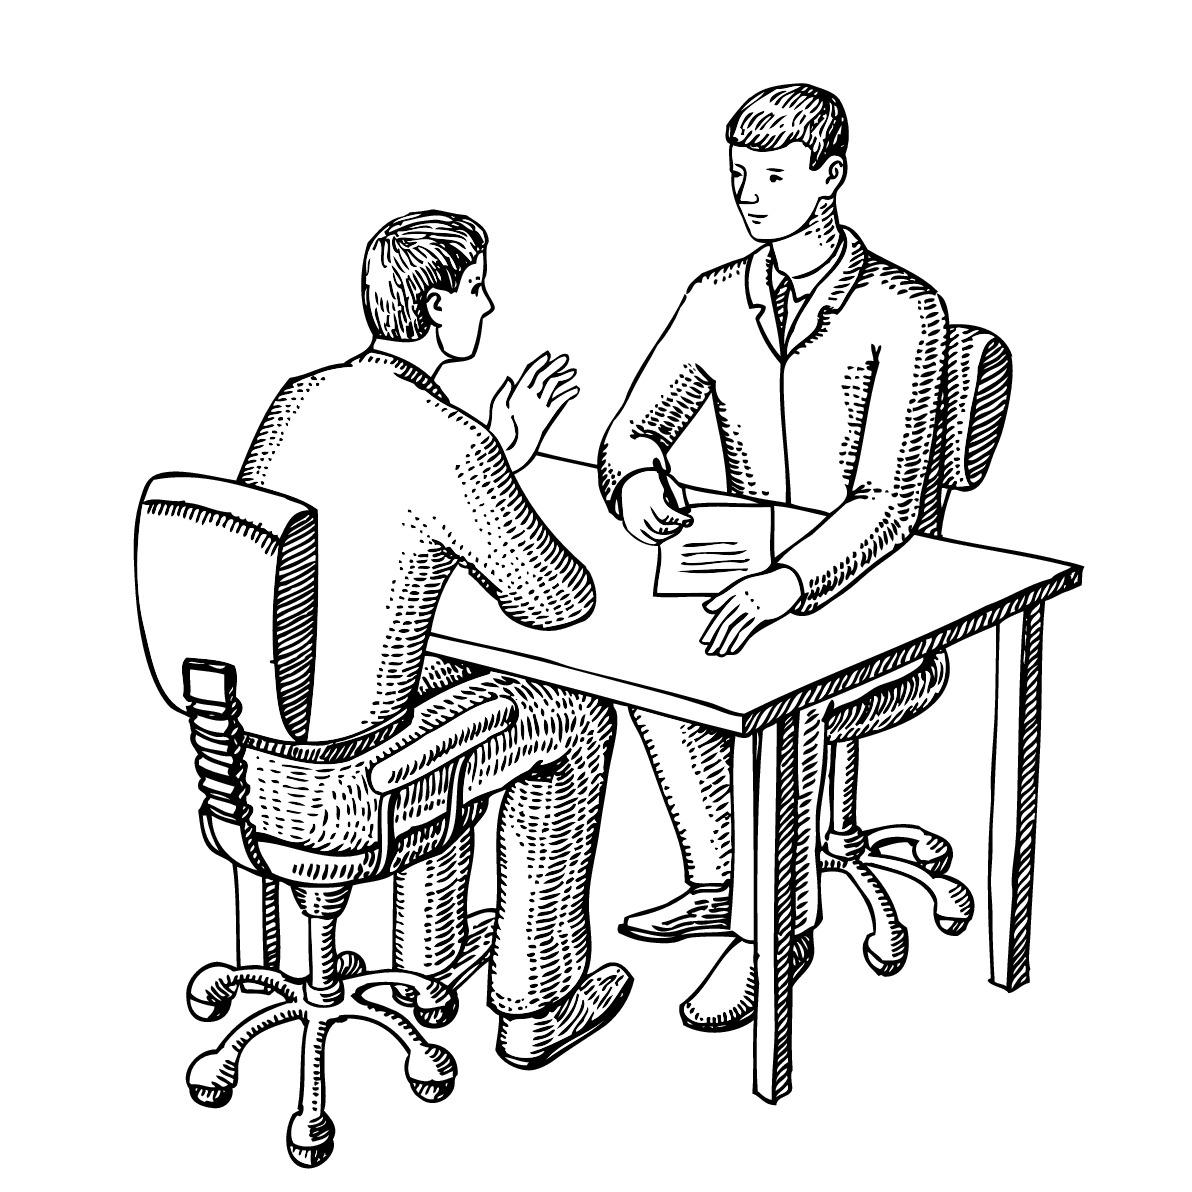 Informal interview clipart.